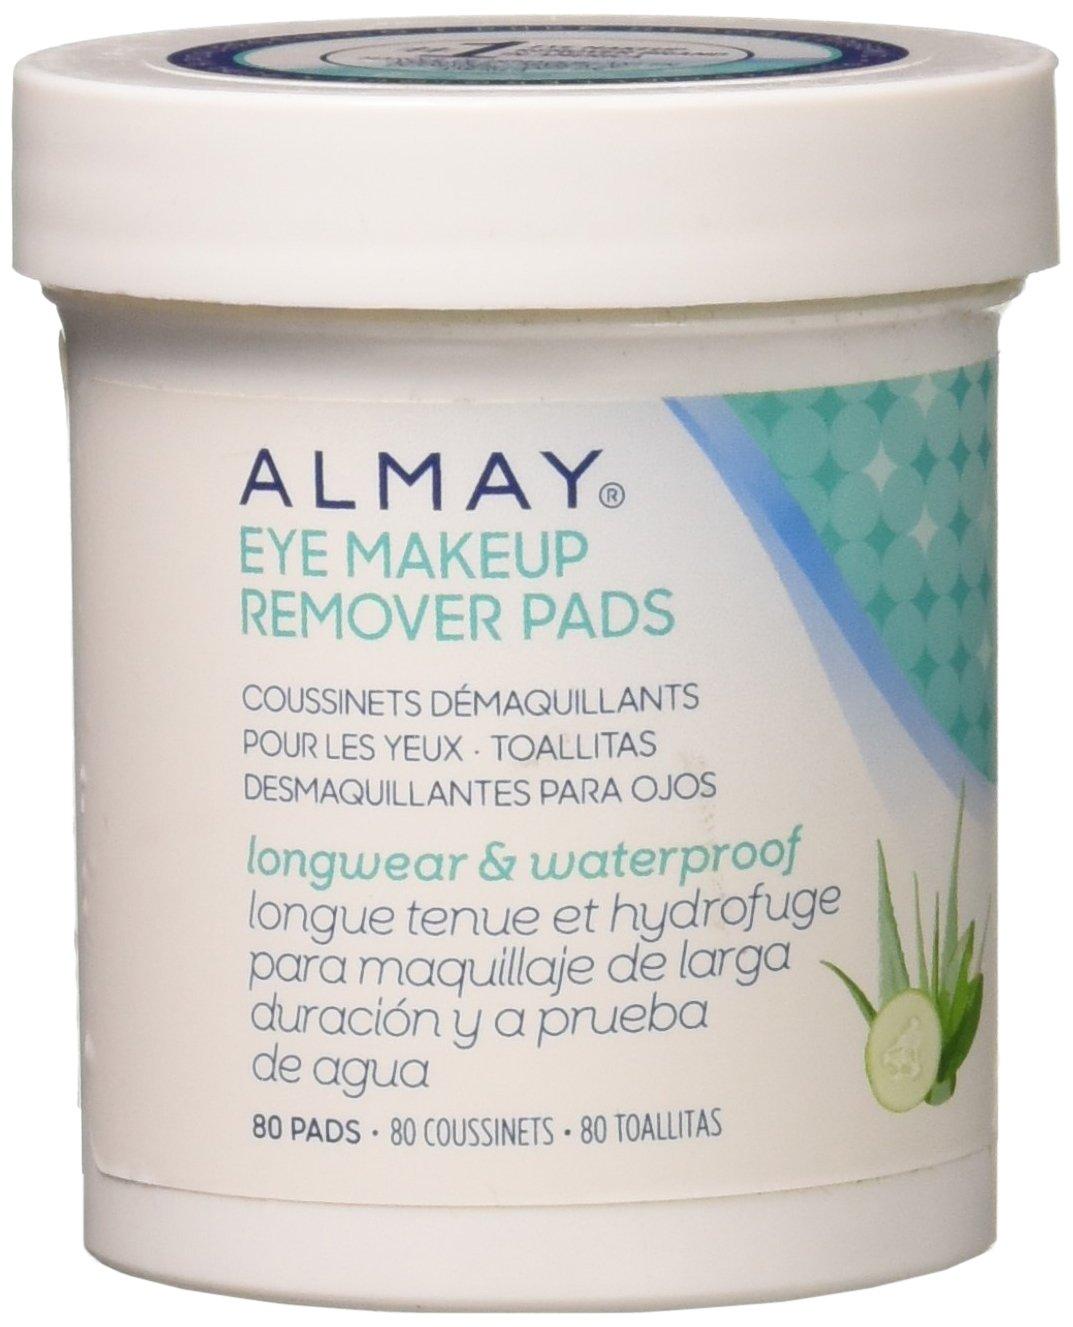 Almay Longwear & Waterproof Eye Makeup Remover Pads, 80 Count(Pack of 2) 80 Count(Pack of 2)